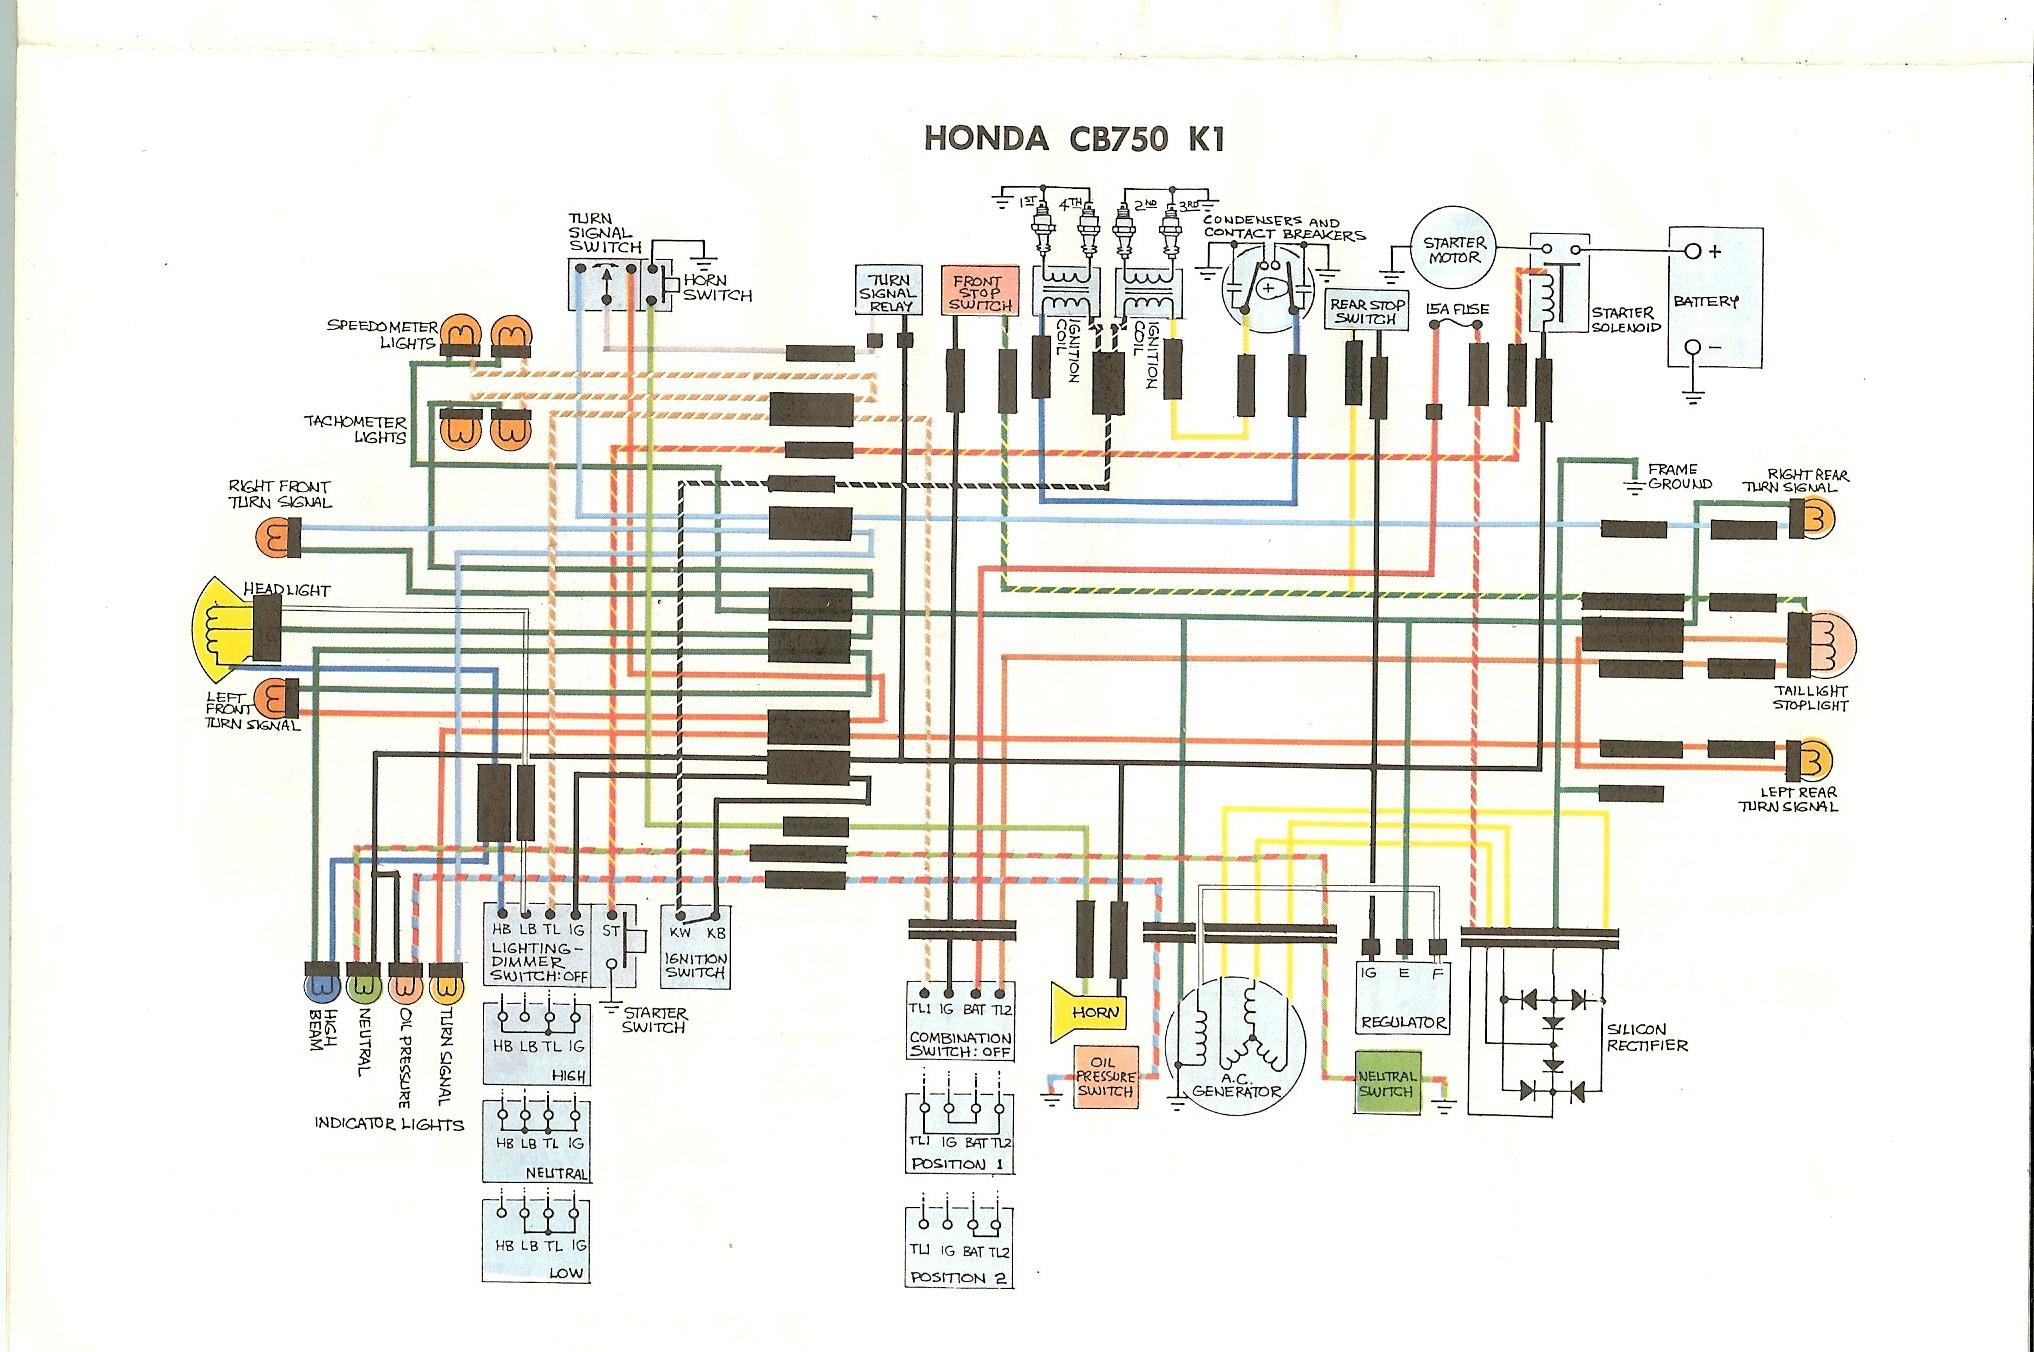 Honda Motorcycle Diagram Wiring Diagram Further Honda Cb 750 Wiring Diagram Cb Www Cb750 Of Honda Motorcycle Diagram